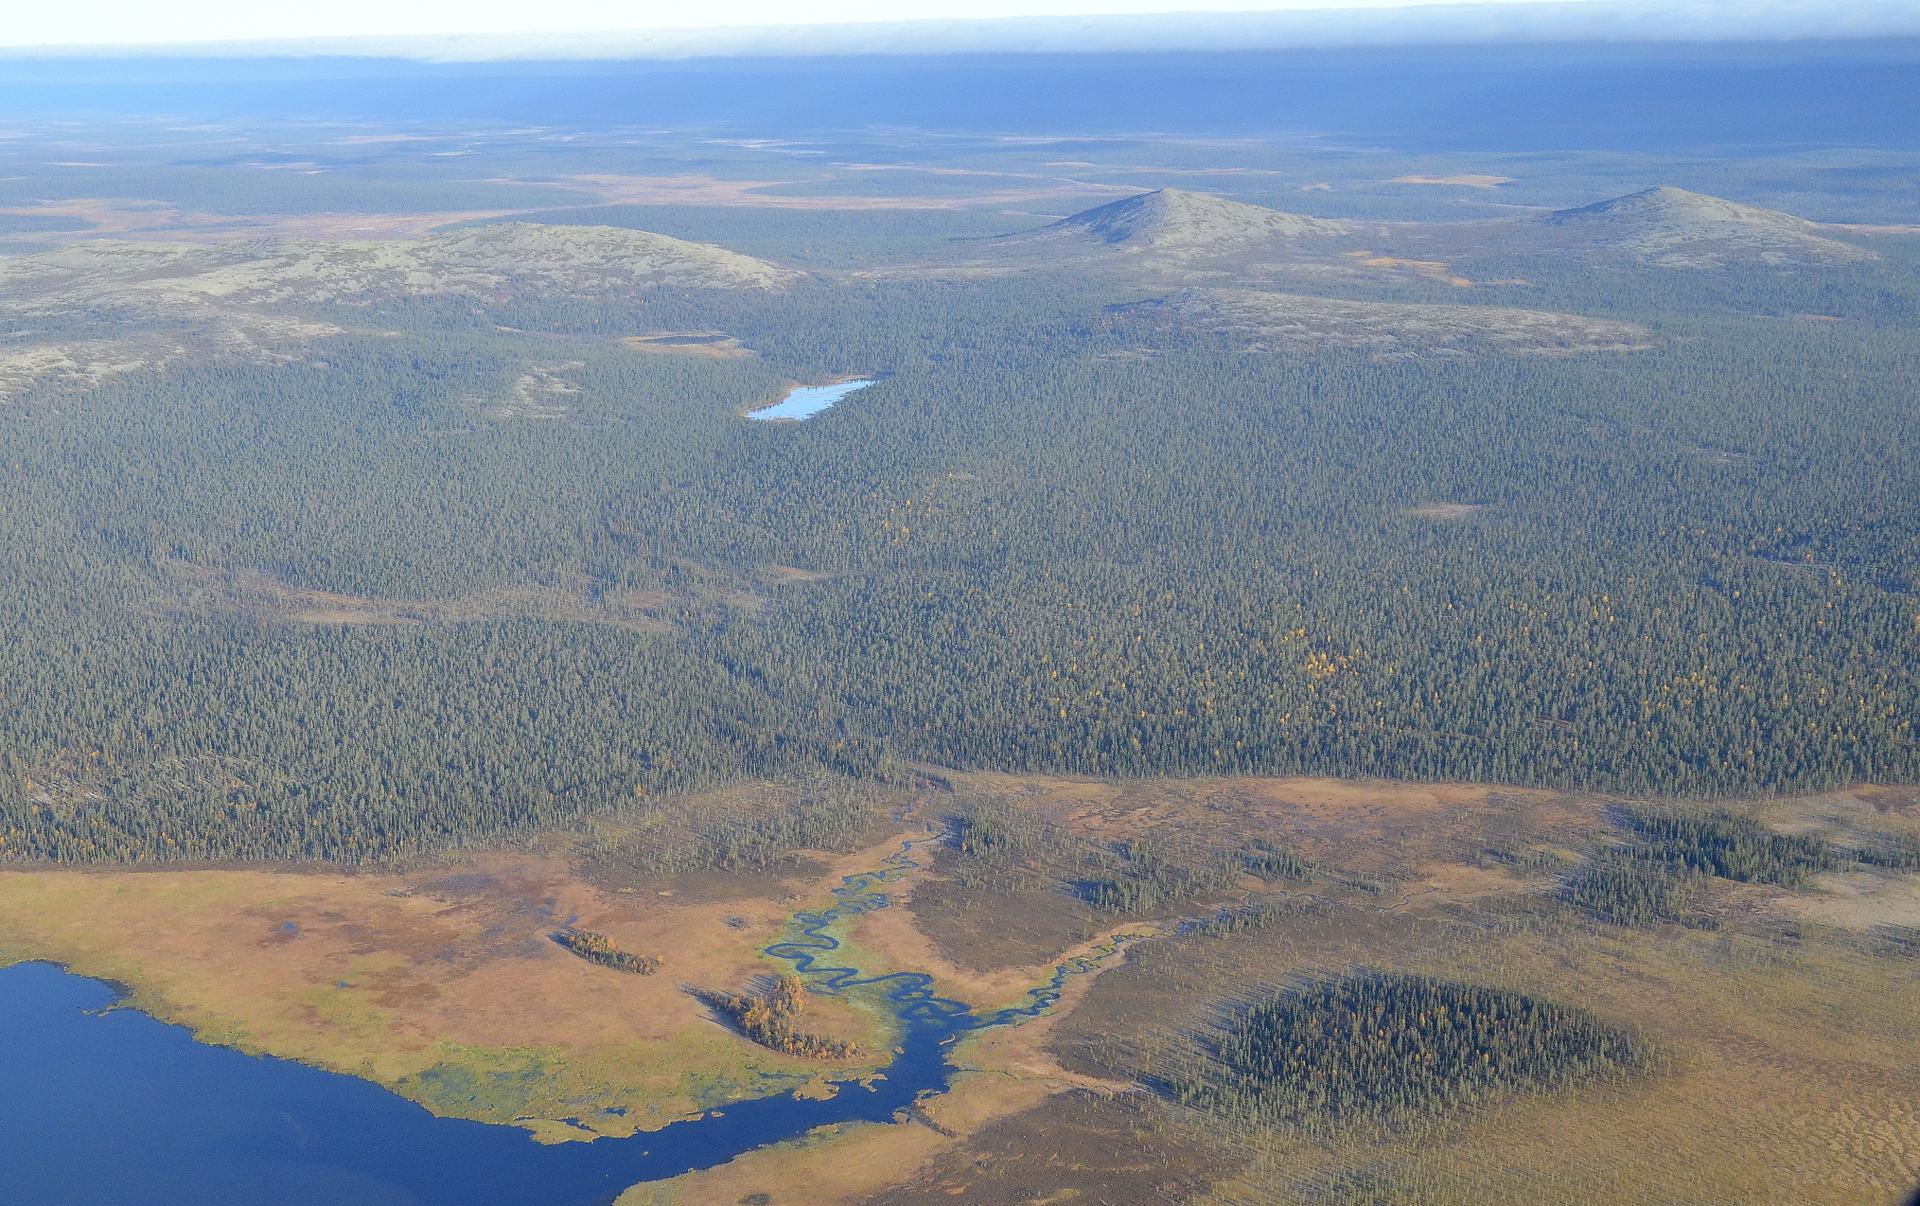 Nattasten kainalossa Hietajärvet. Kuvassa alempana Sompiojärvi.